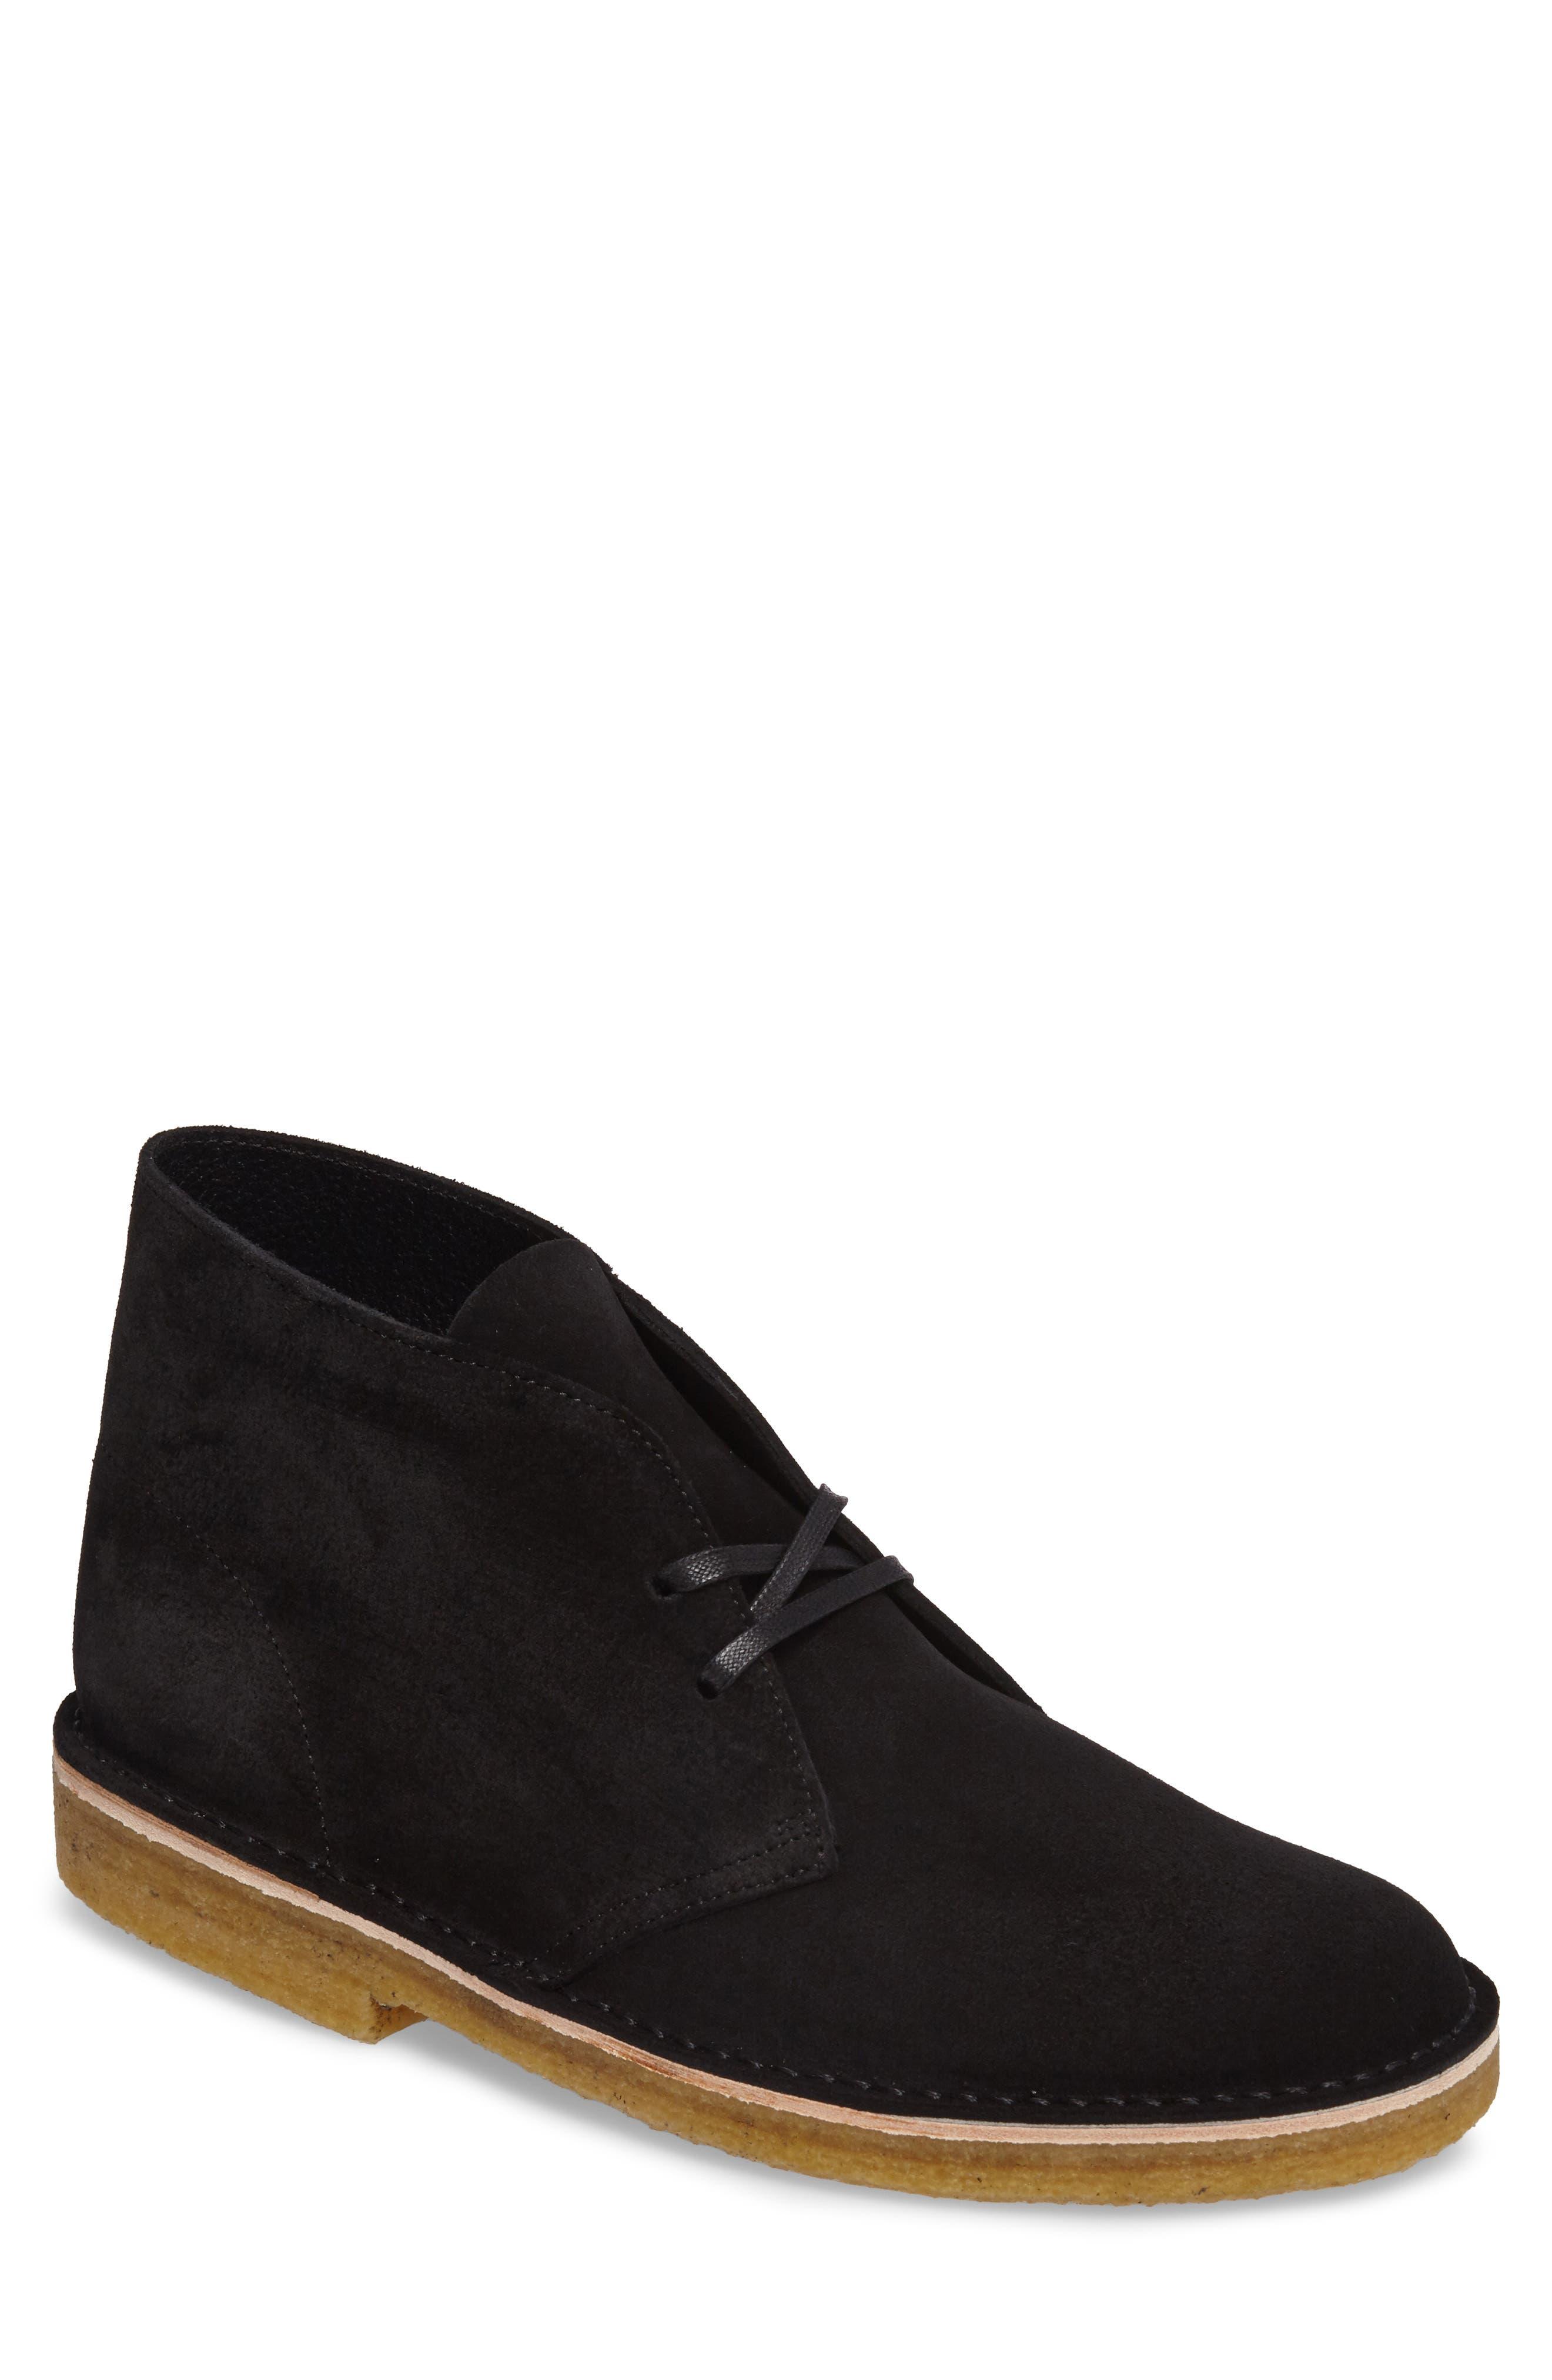 Desert Chukka Boot,                         Main,                         color, BLACK SUEDE